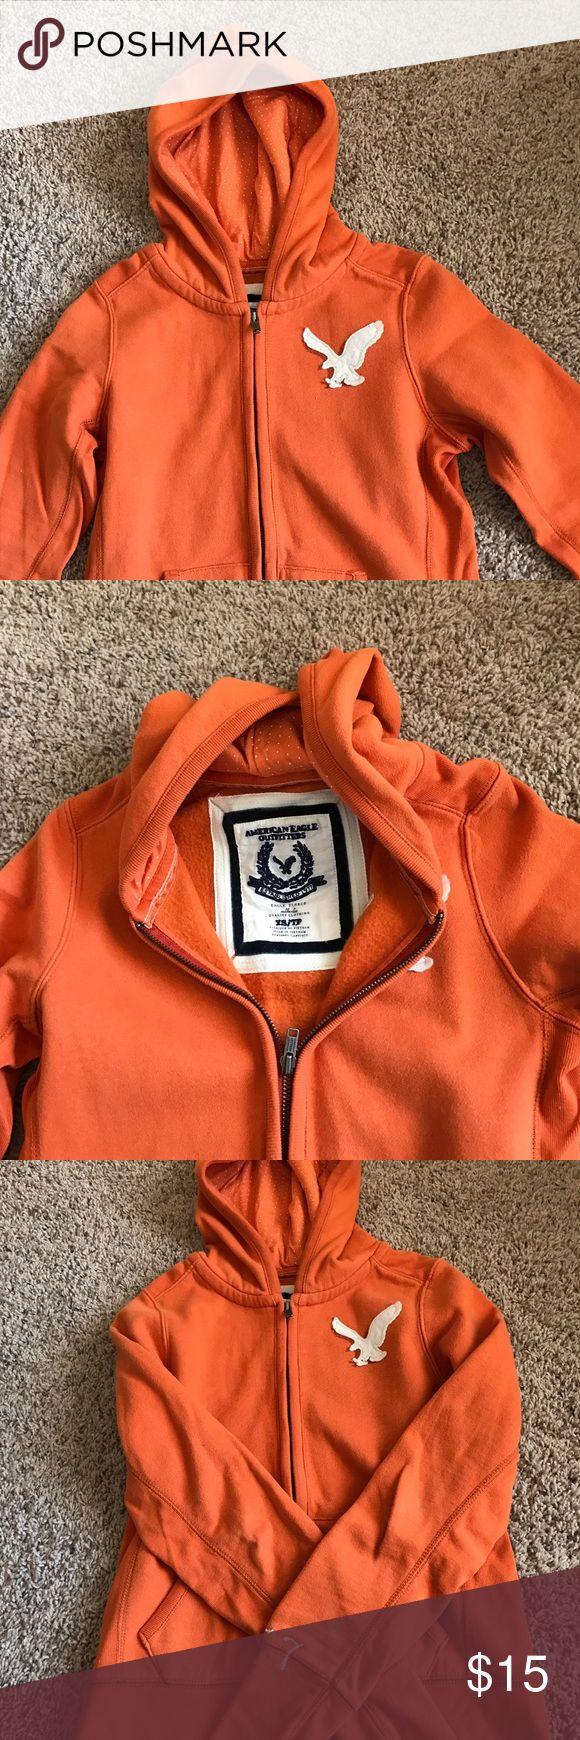 American Eagle Sweatshirt Orange, Xsmall, American eagle sweatshirt American Eagle Outfitters Tops Sweatshirts & Hoodies